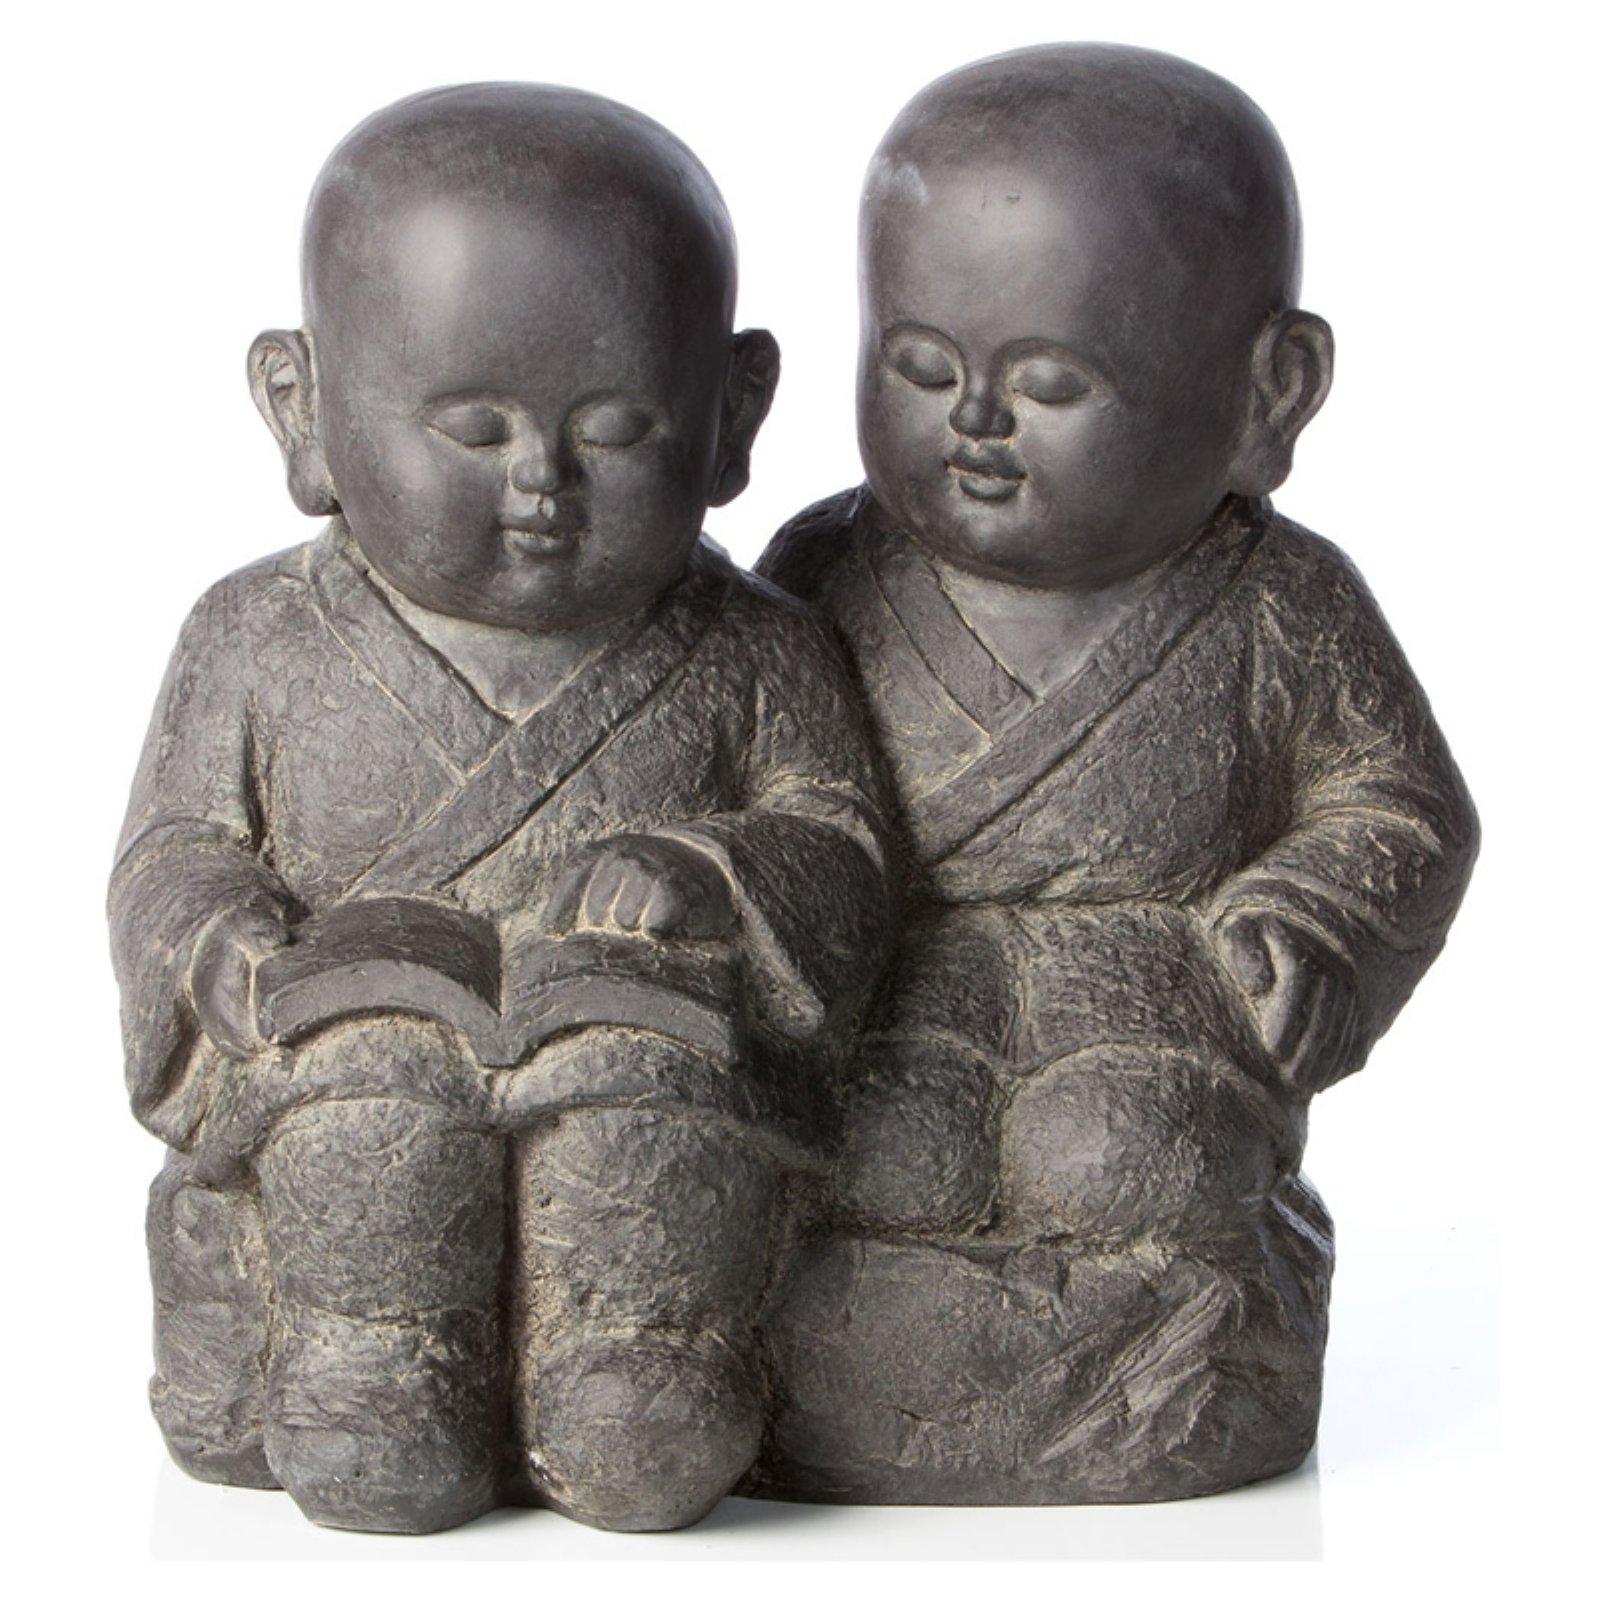 Alfresco Home Buddha Buddies Garden Statue